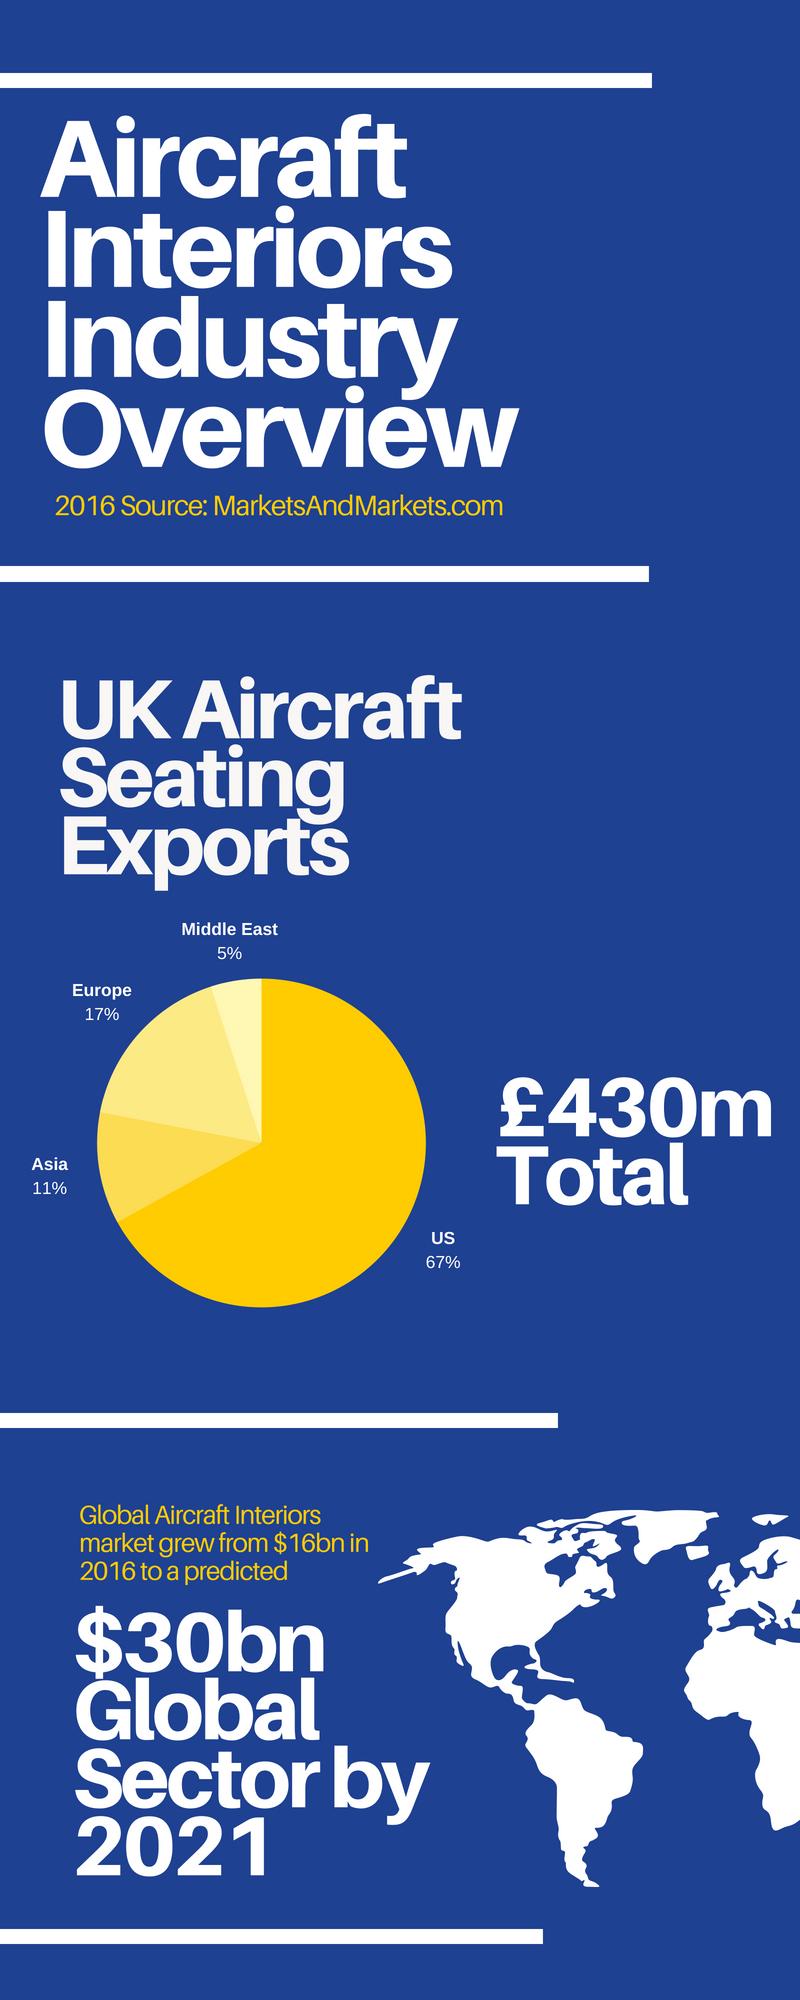 medium resolution of 2016 source marketsandmarkets com uk aircraft seating exports